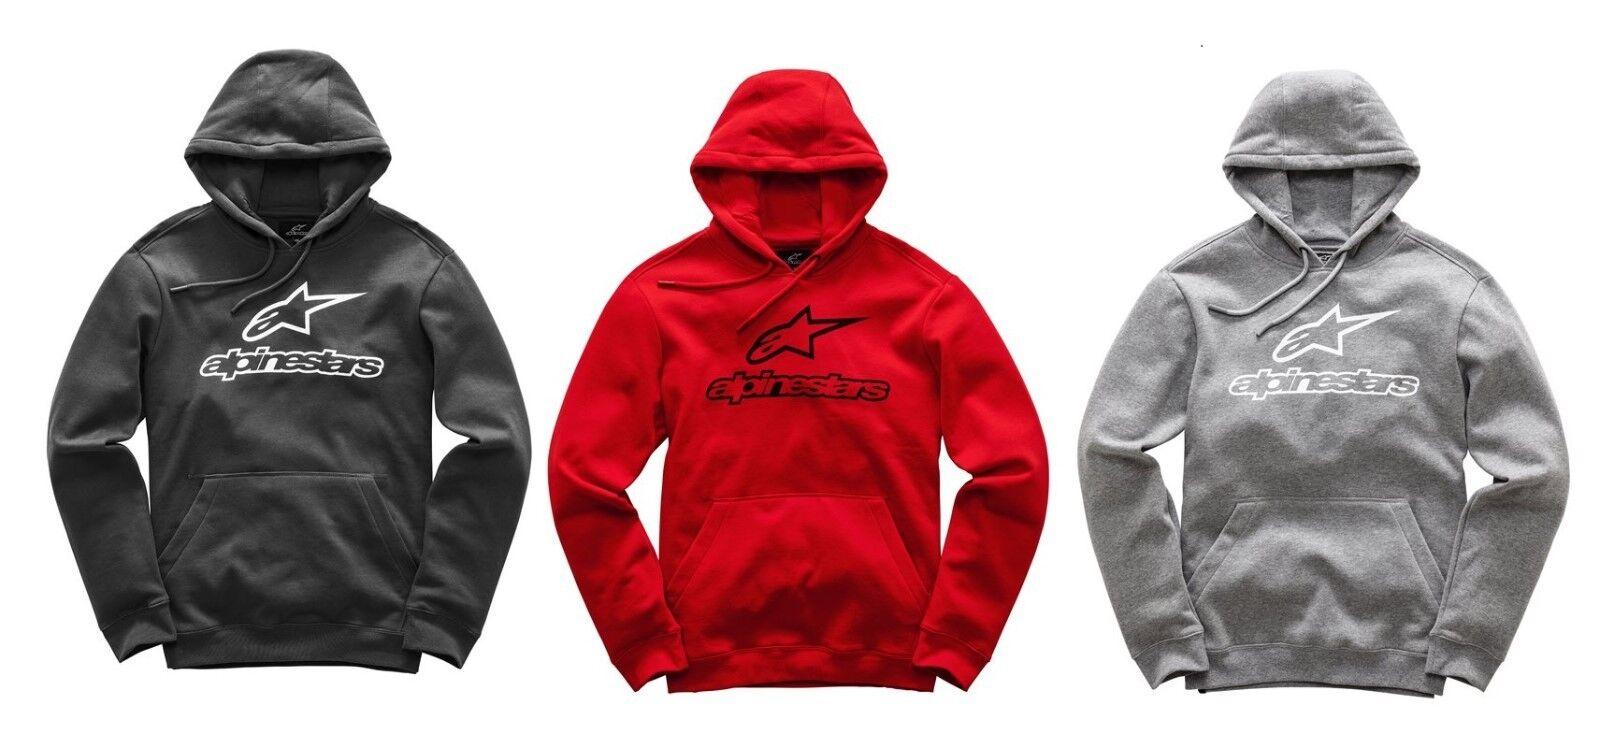 Alpinestars Always Casual wear Hoodie Men   damen Unisex - pull over hoody